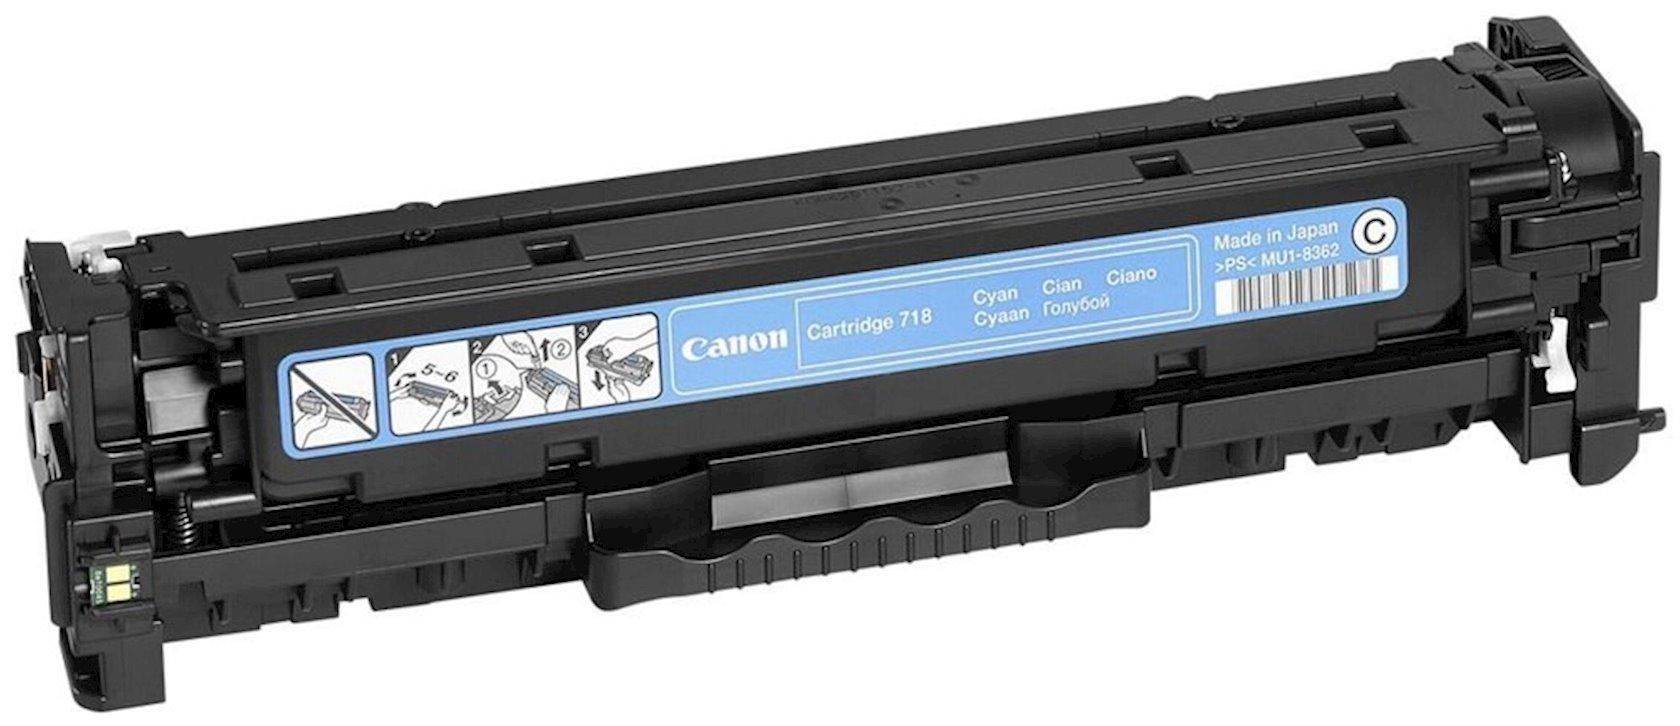 Toner-kartric Canon 718 Cyan